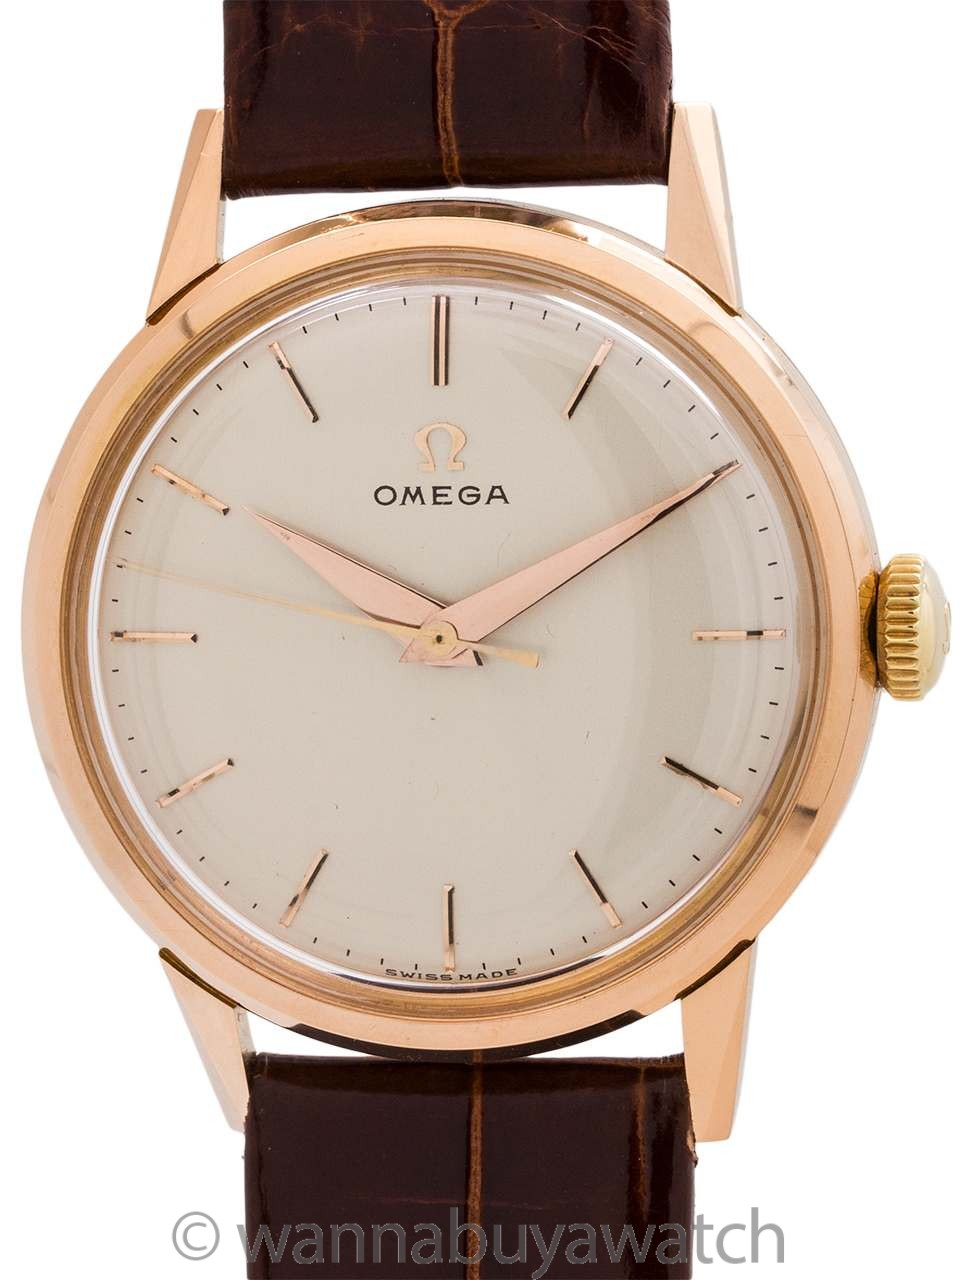 Omega 18K Rose Gold Dress Model circa 1956